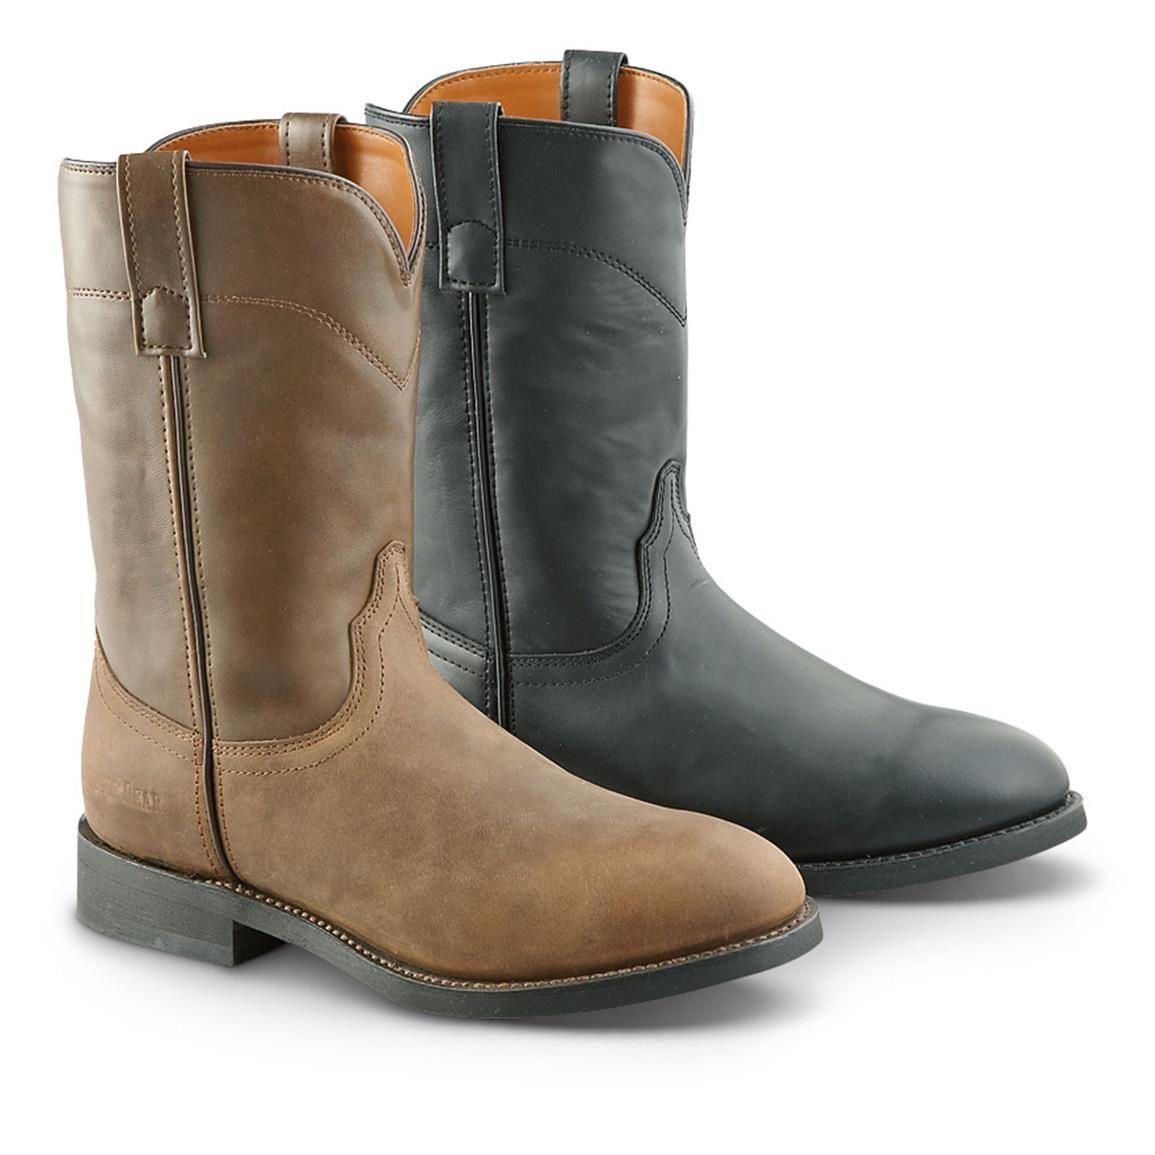 789c24979 Guide Gear Men's Western Roper Boots, Brown / Black | 365 Outdoor ...